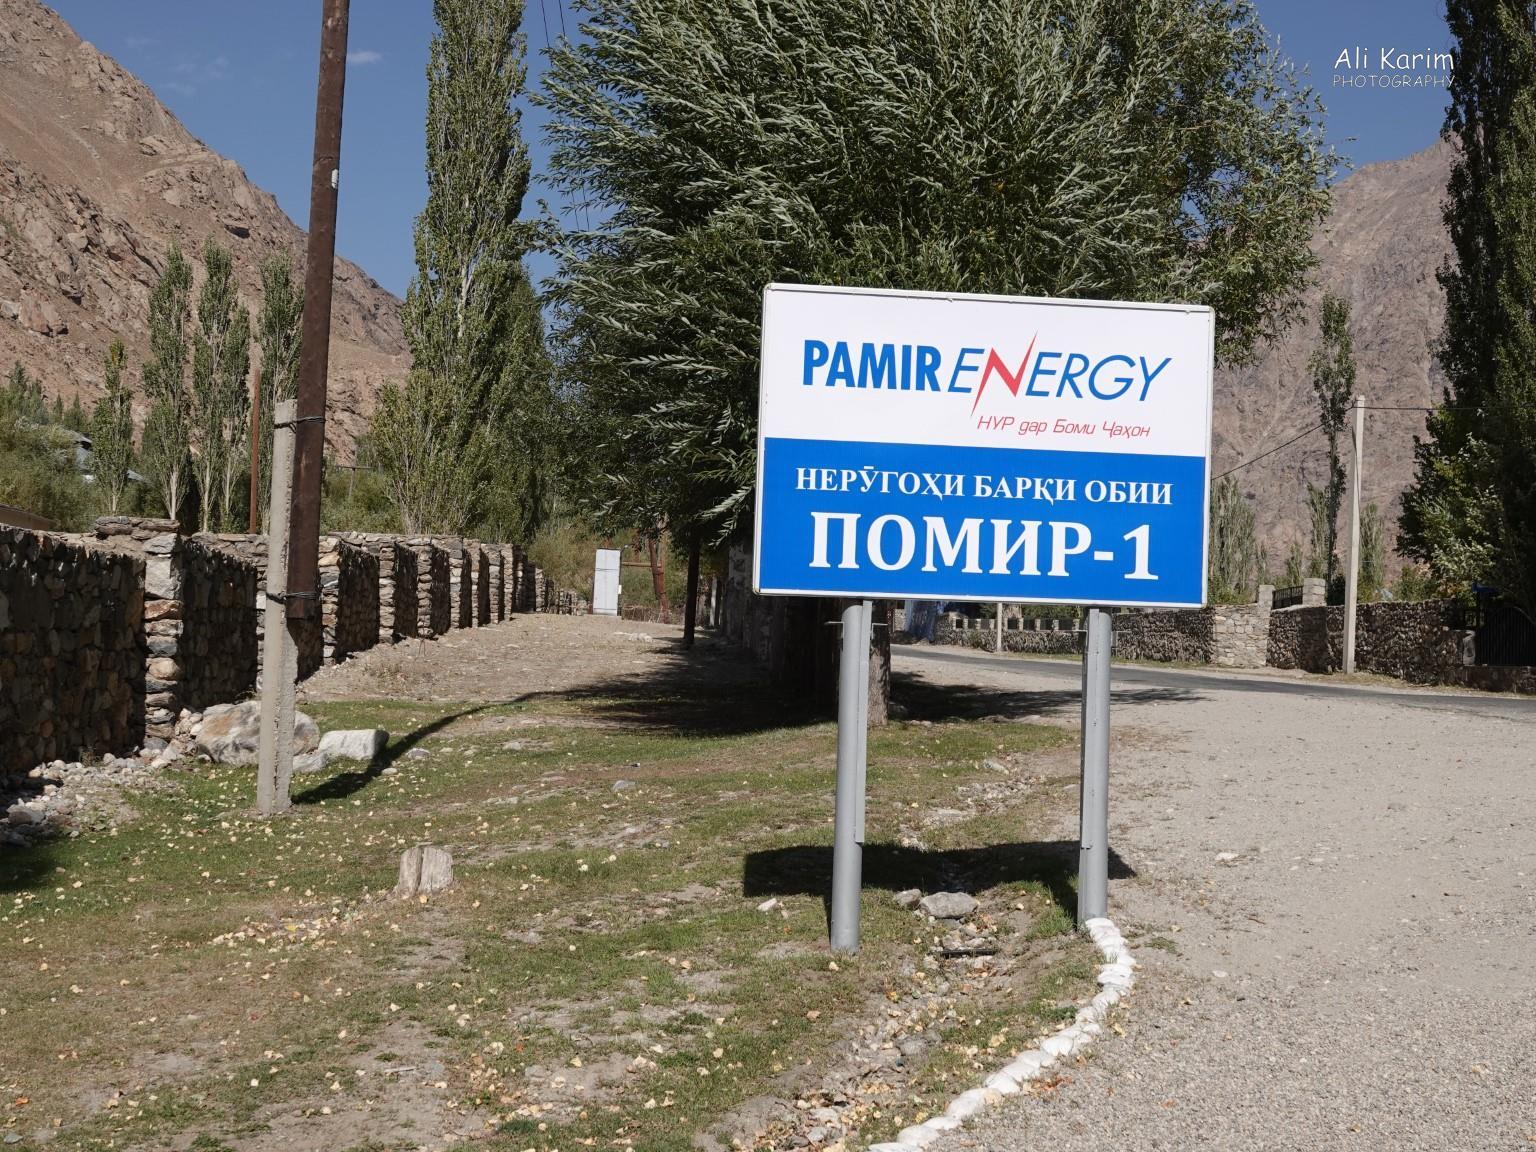 More Khorog, Tajikistan Pamir Energy